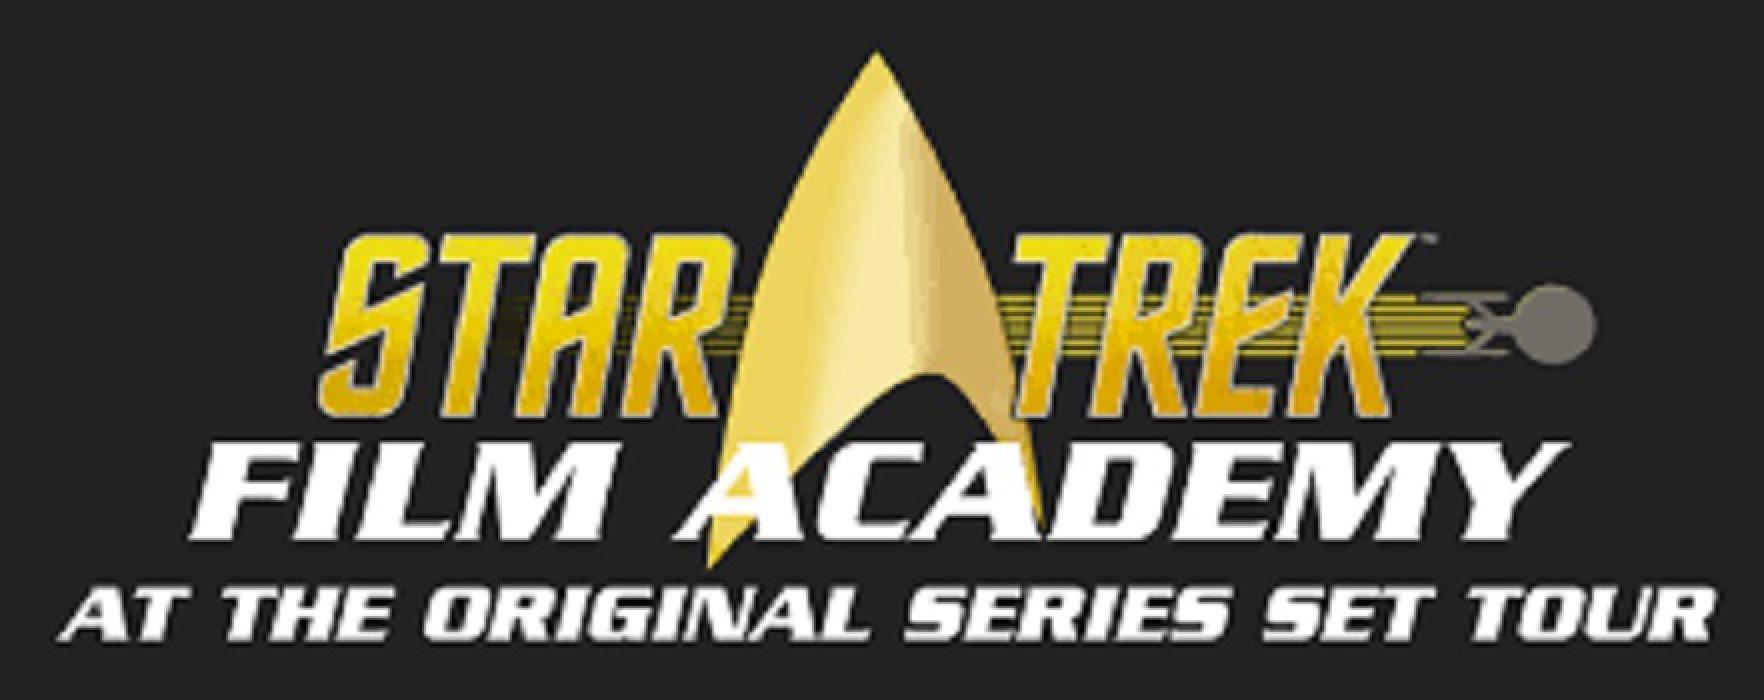 Star Trek Film Academy Coming in 2018